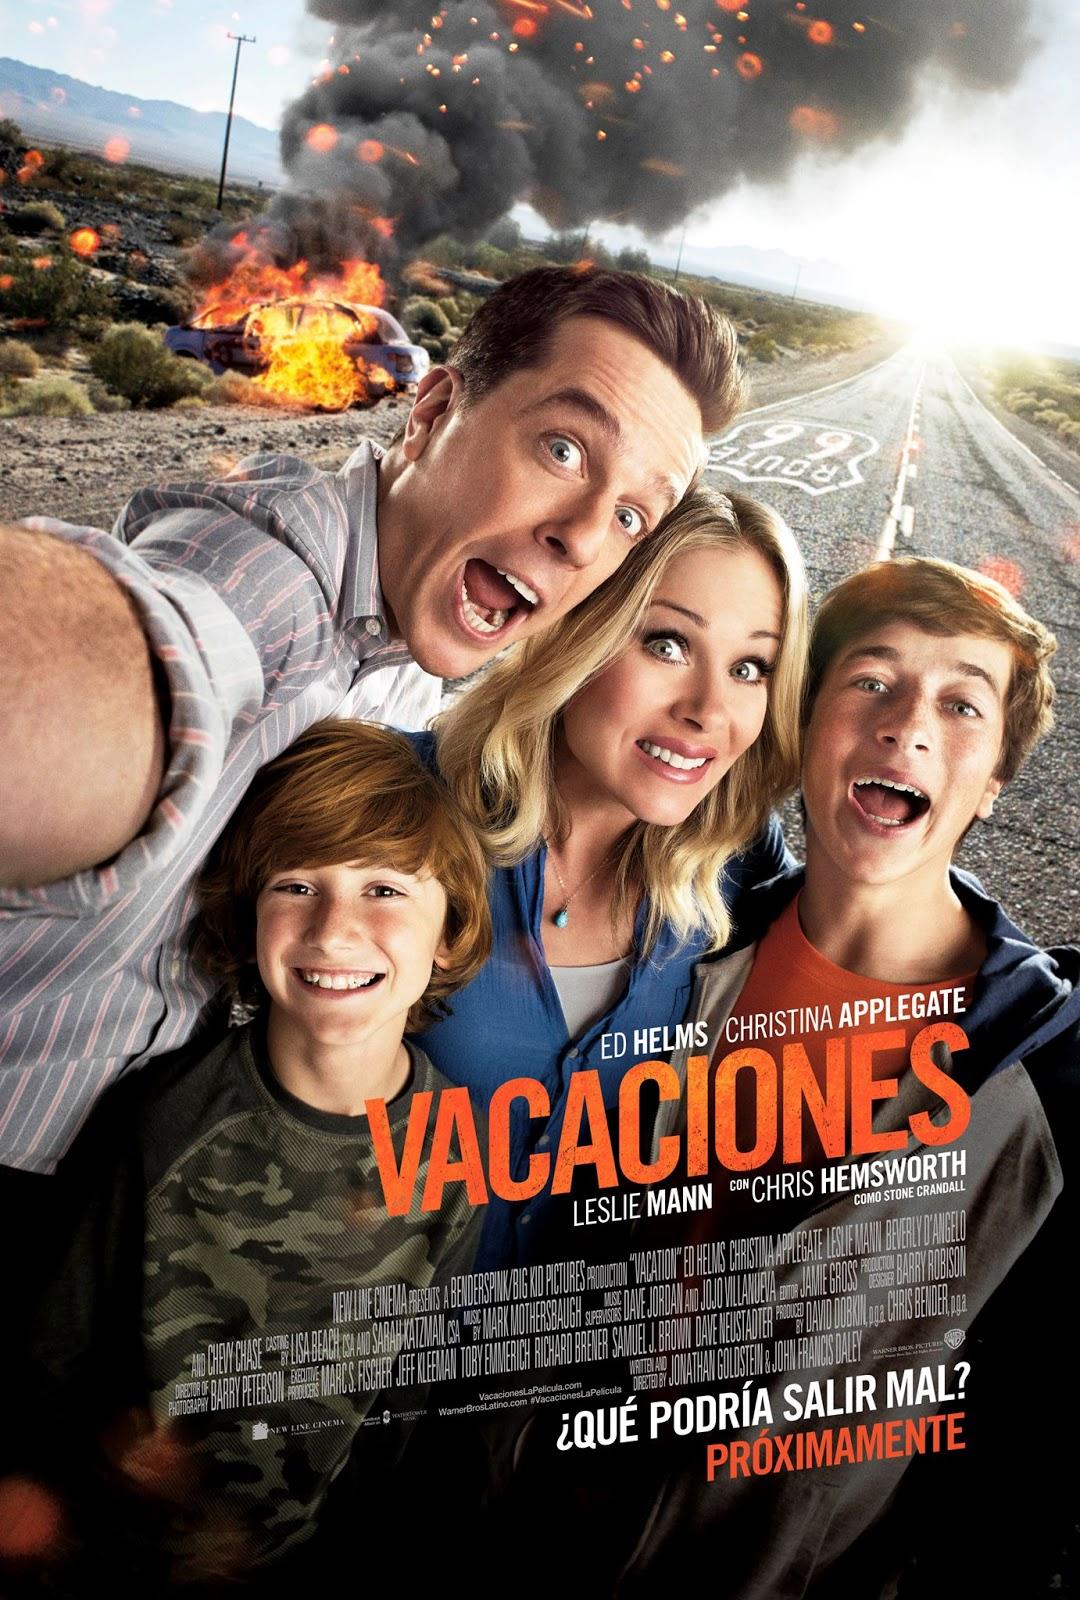 https://i2.wp.com/1.bp.blogspot.com/-KLvnbv4BTrw/VY2CdXlxwOI/AAAAAAAAfM0/54fzpj2-zCI/s1600/Vacaciones_Poster_Final_Latino_Jposters.jpg?resize=194%2C288